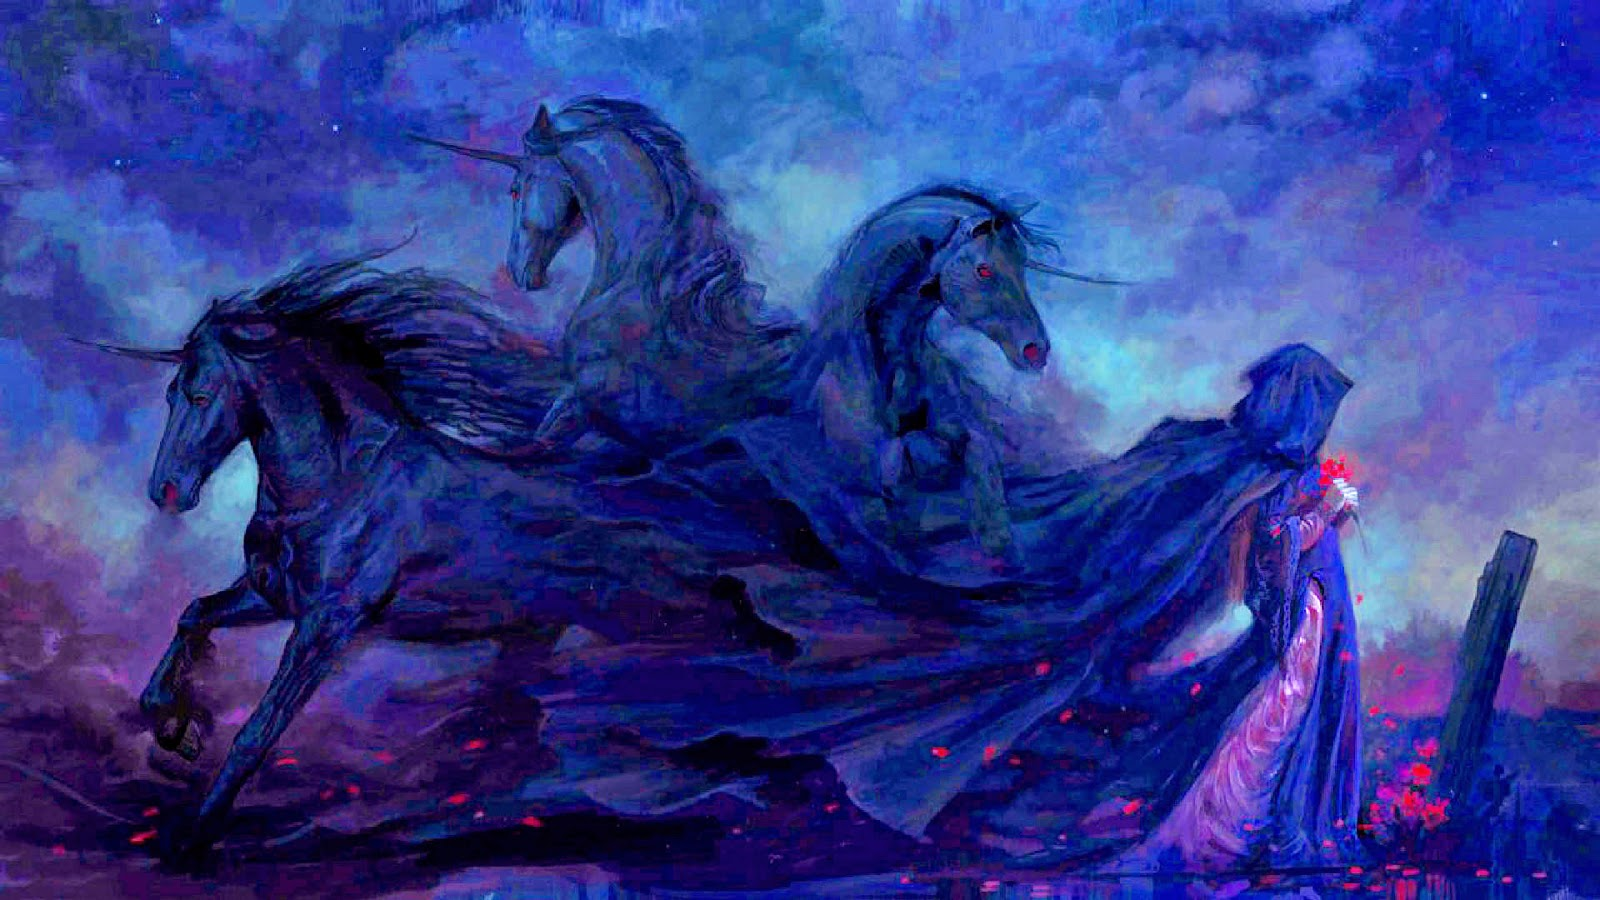 Unicorns-black-BG-theme-1920x1080-HD-Wallpaper.jpg